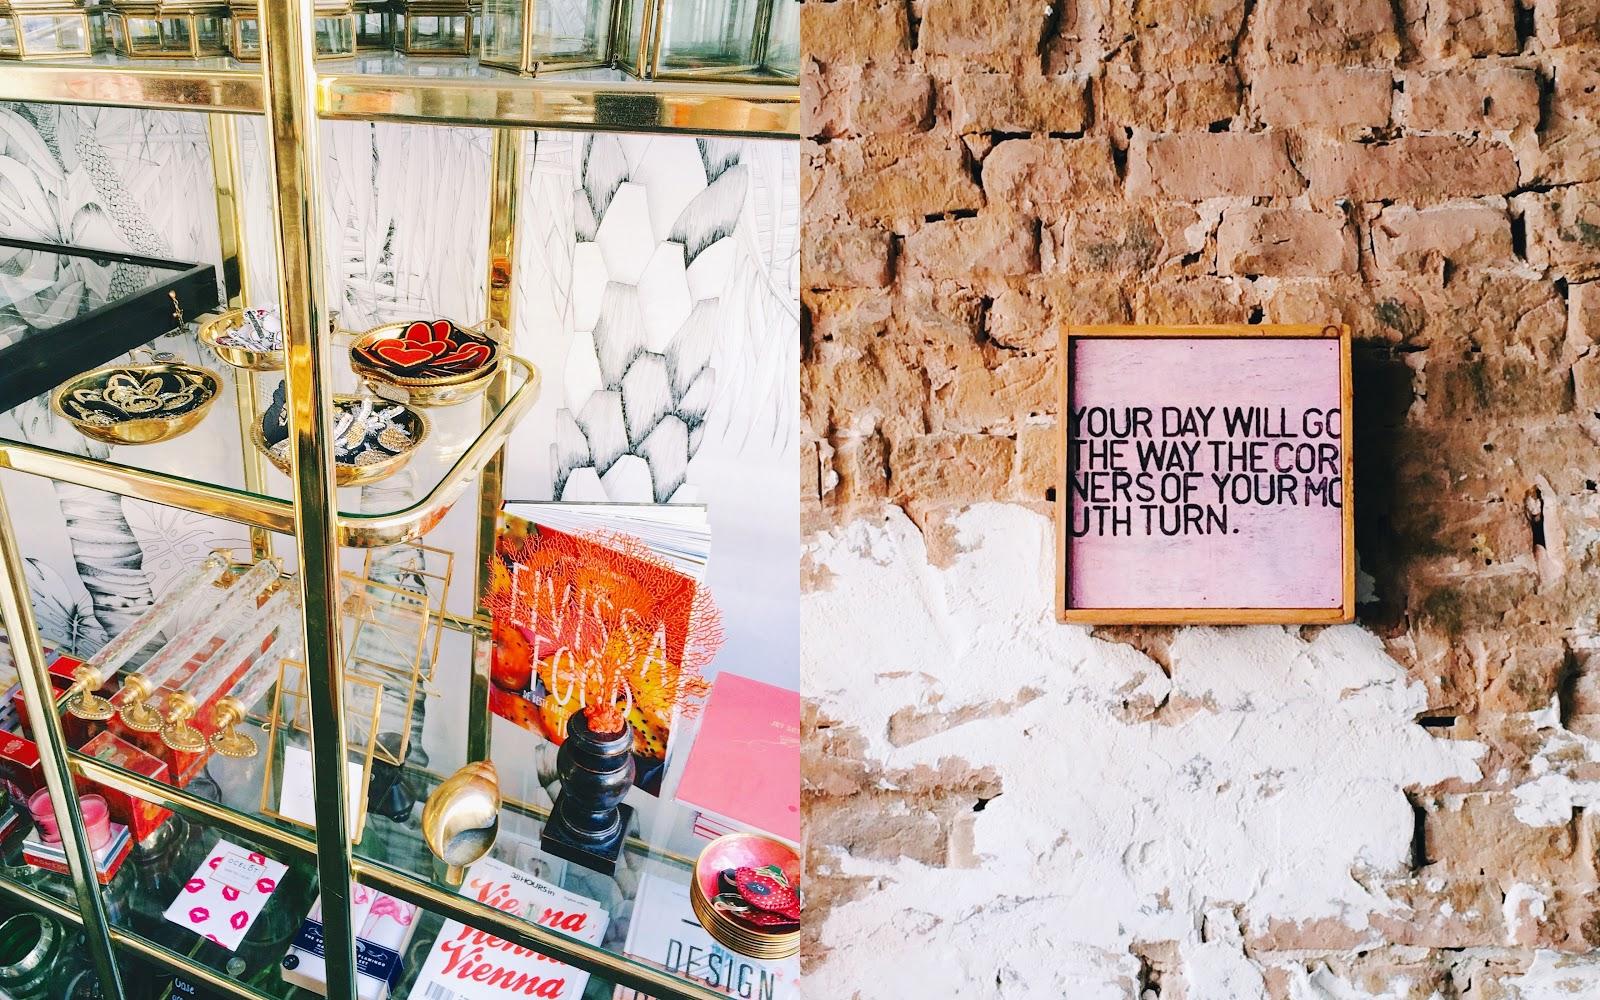 Anna + Nina Amsterdam Concept Store